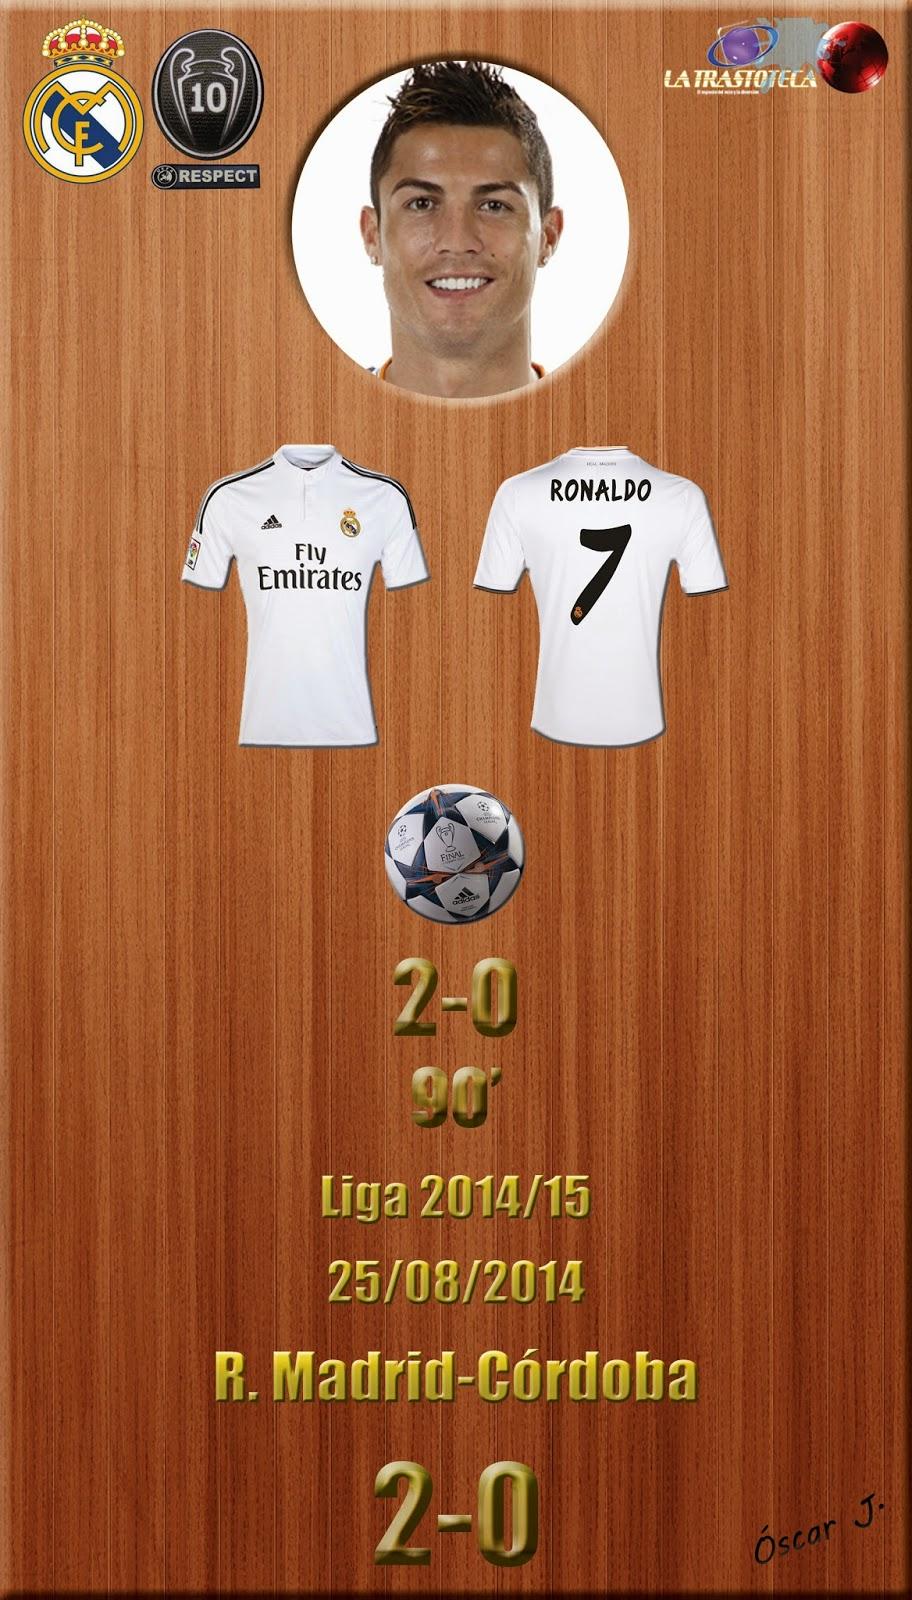 Cristiano Ronaldo (2-0) - Jornada 1 - 25/8/2014